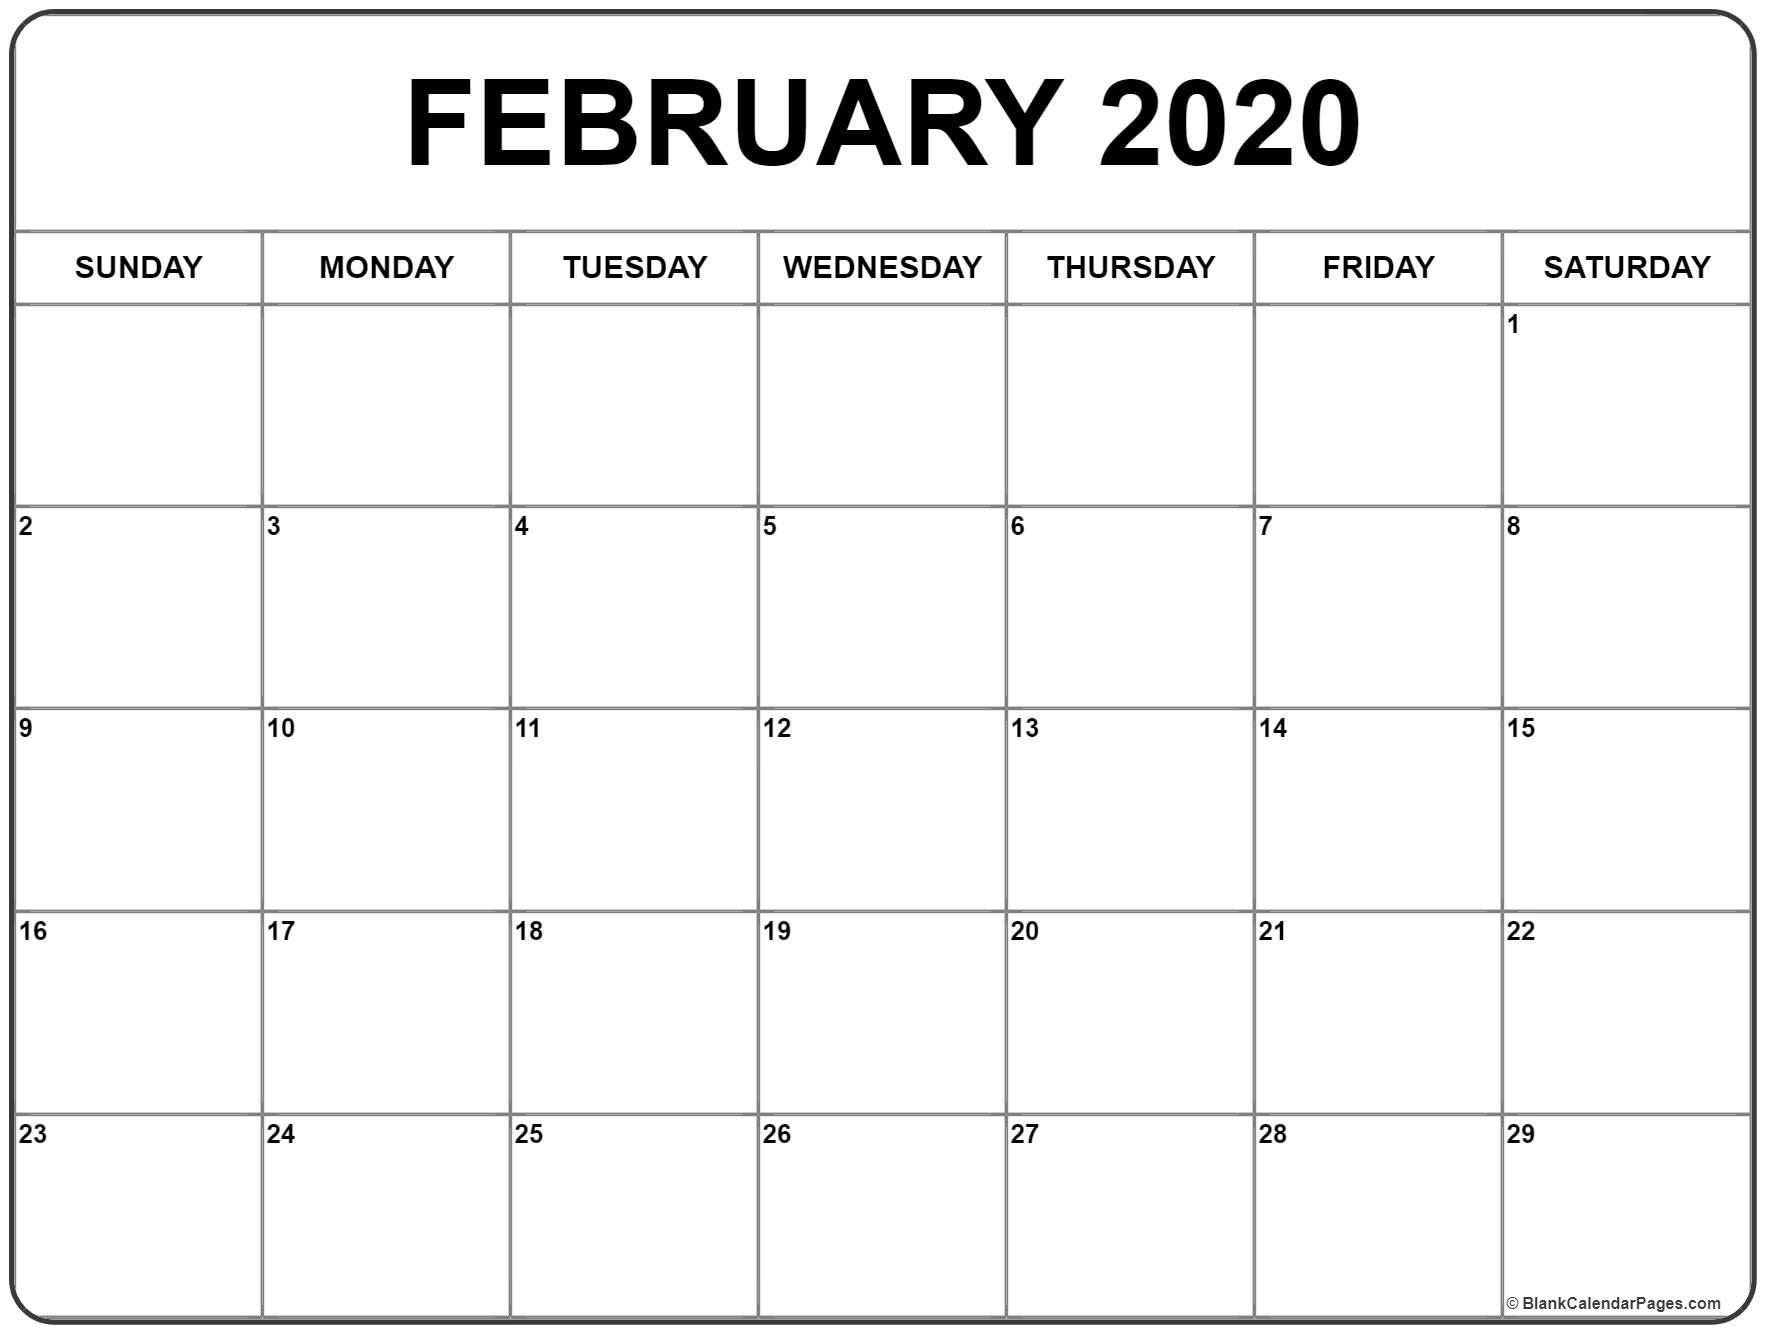 February 2020 Calendar | Free Printable Monthly Calendars_Calendar Blank February 2020